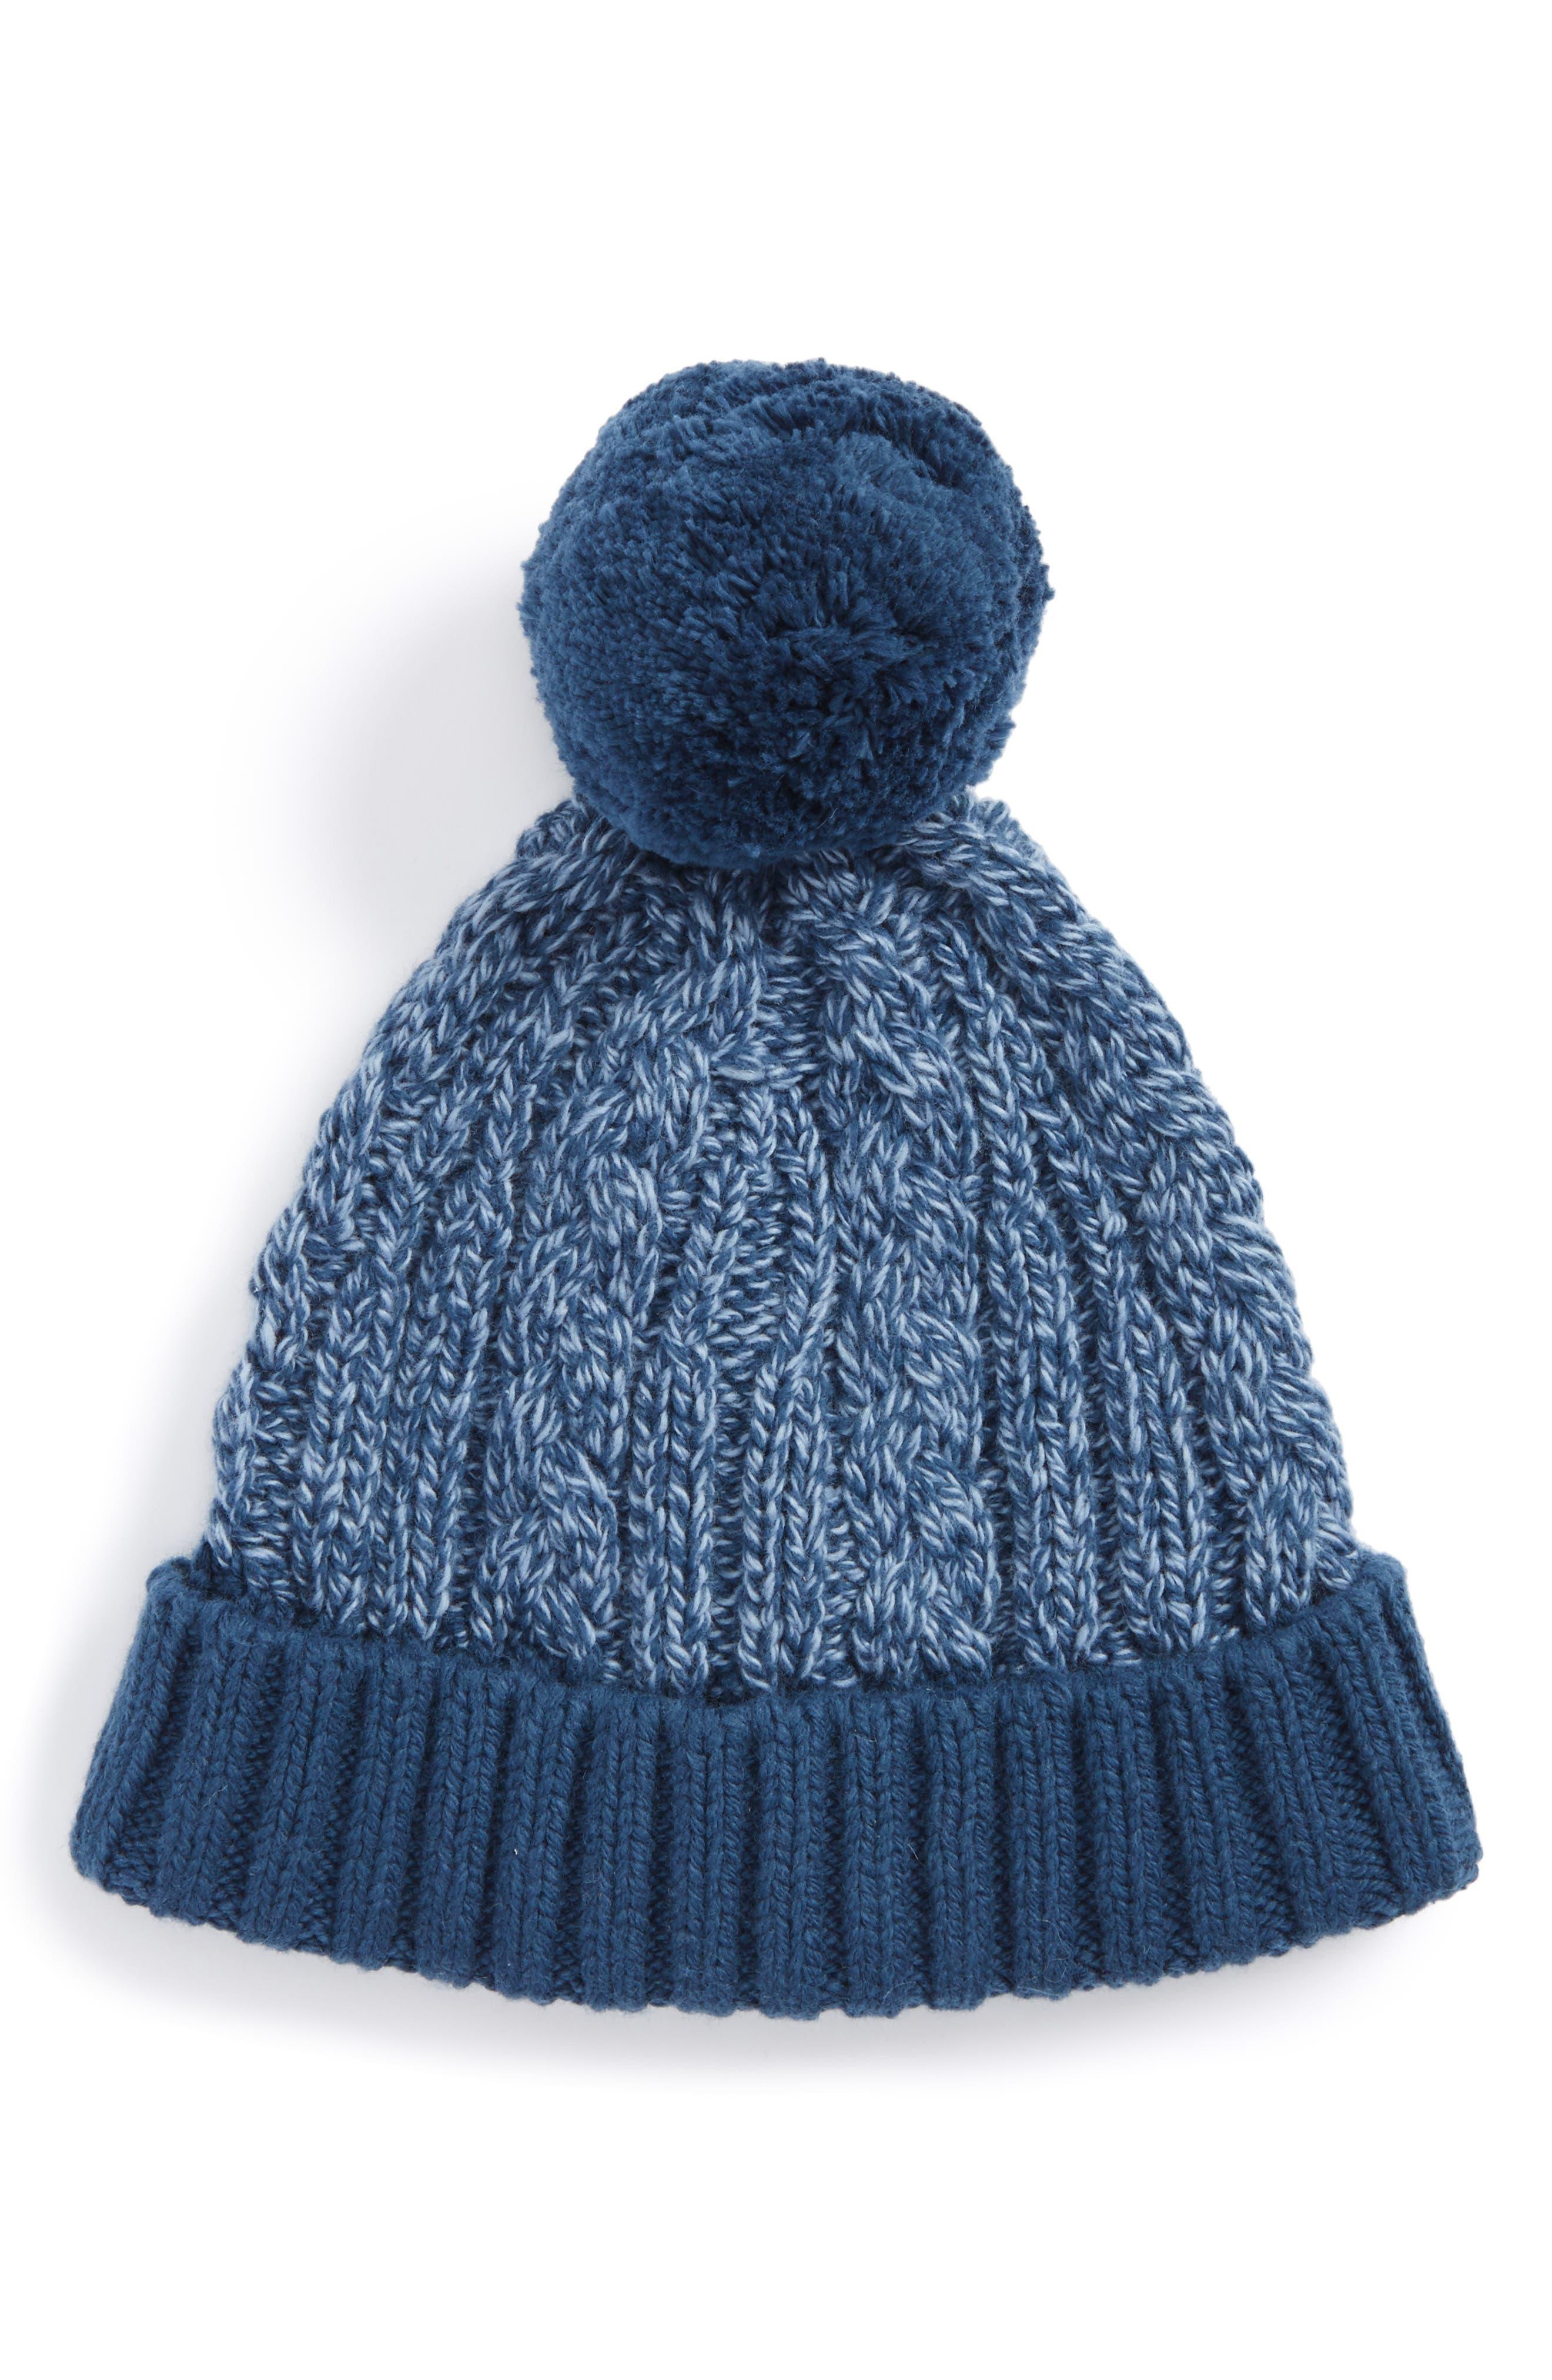 Cable Knit Pompom Hat,                         Main,                         color, Navy Denim- Blue